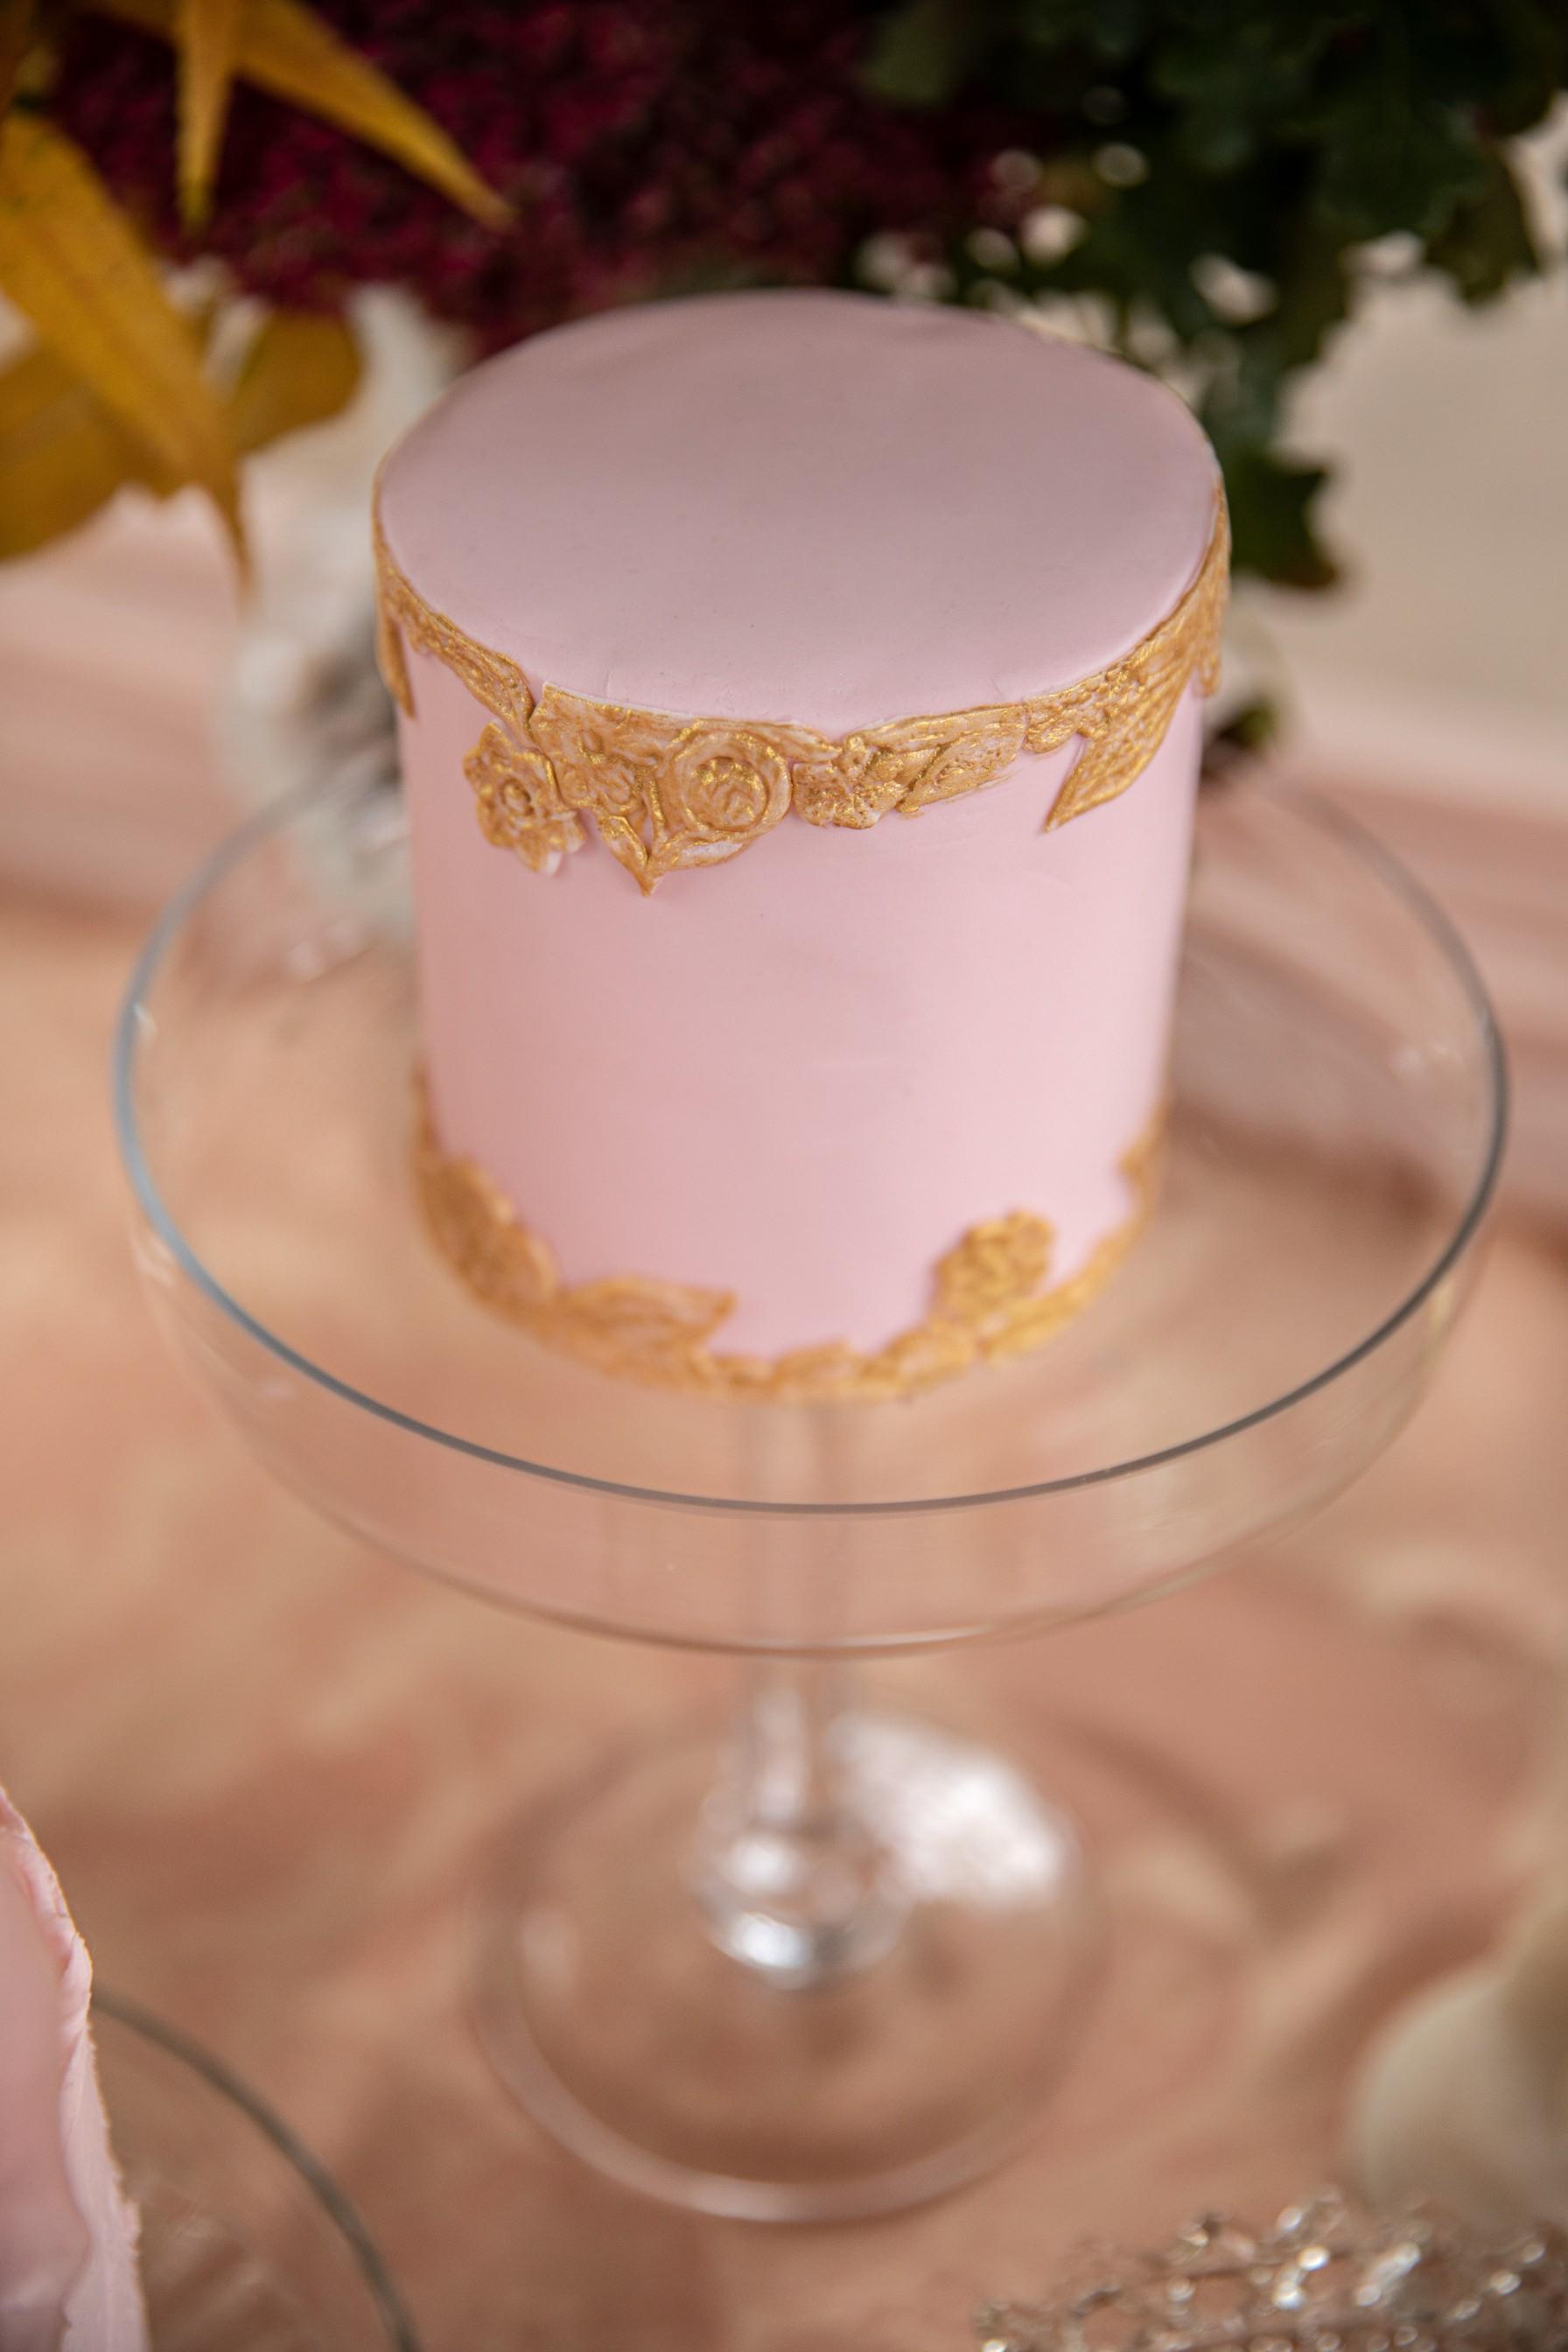 pink wedding cake - small wedding cake - mini wedding cake